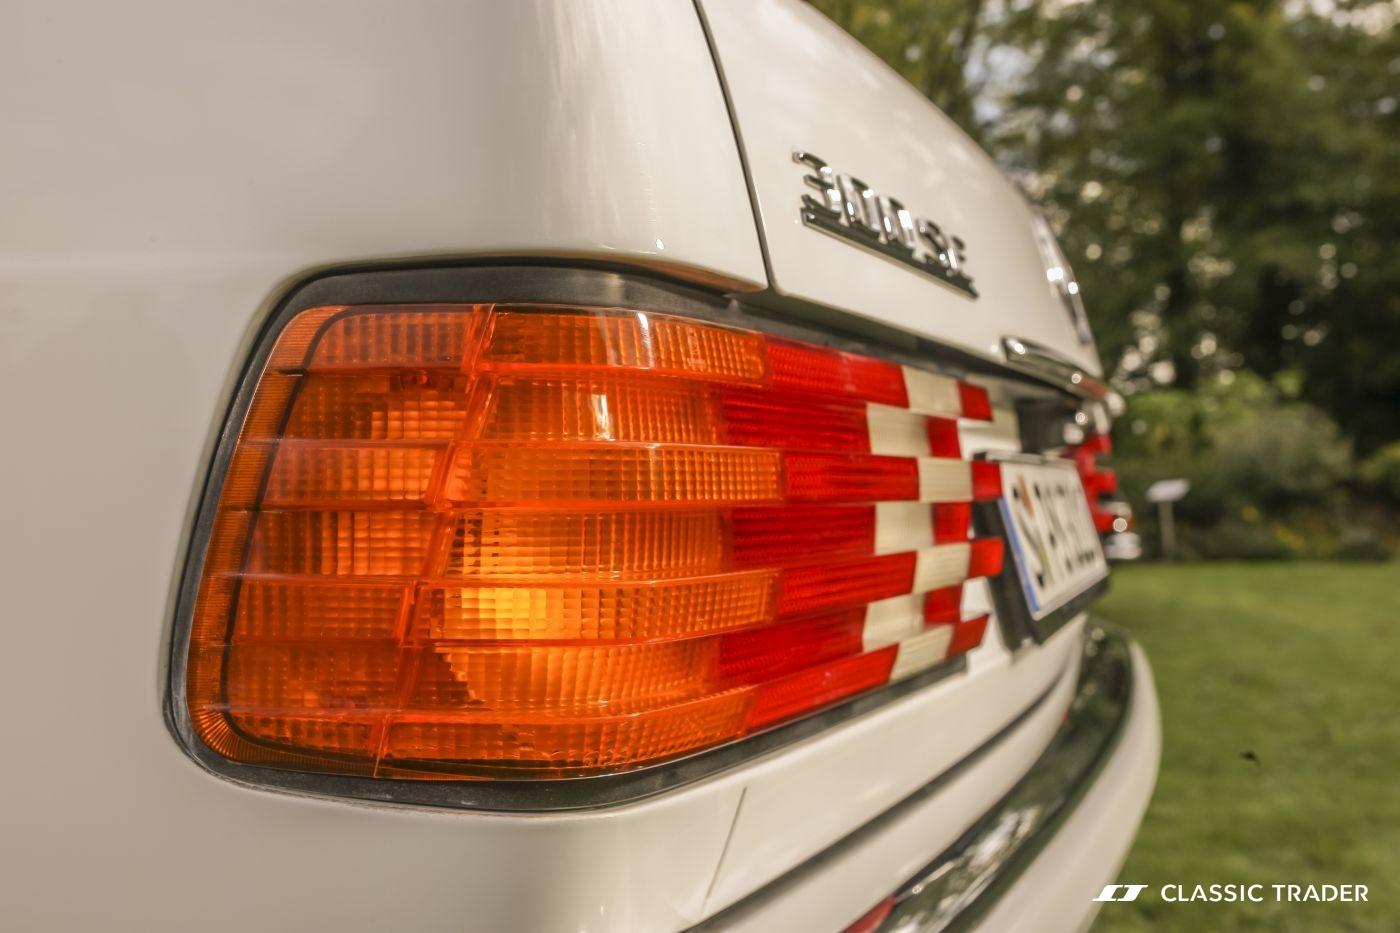 Mercedes-Benz W 126 S Klasse 300 SE (20)